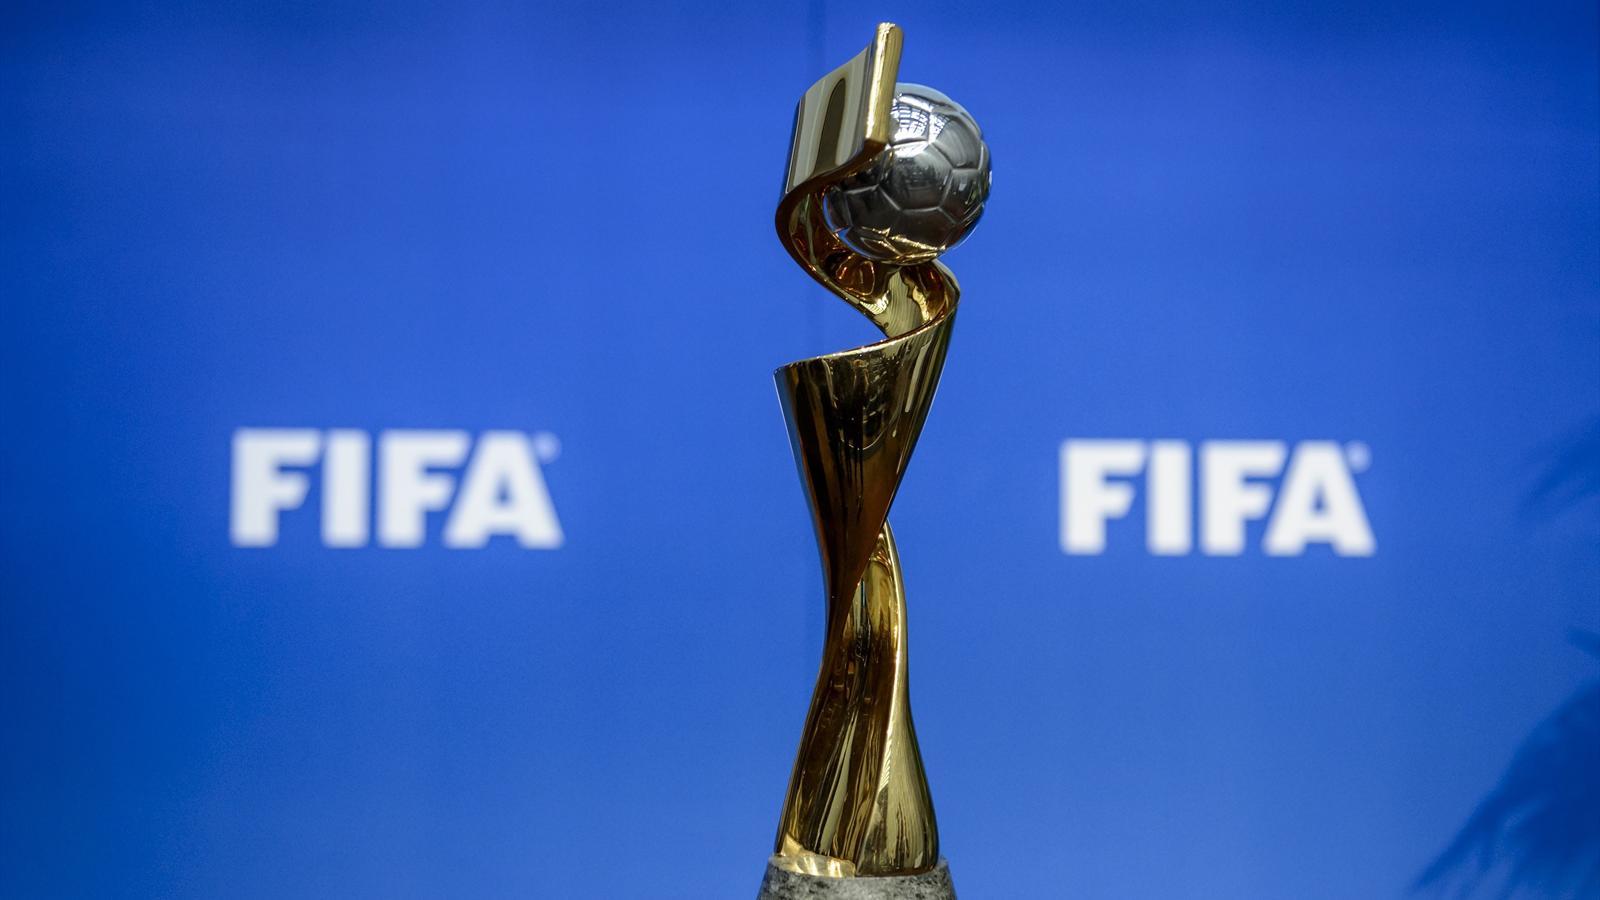 Le programme tv de la coupe du monde de football f minin - Resultat foot feminin coupe de france ...